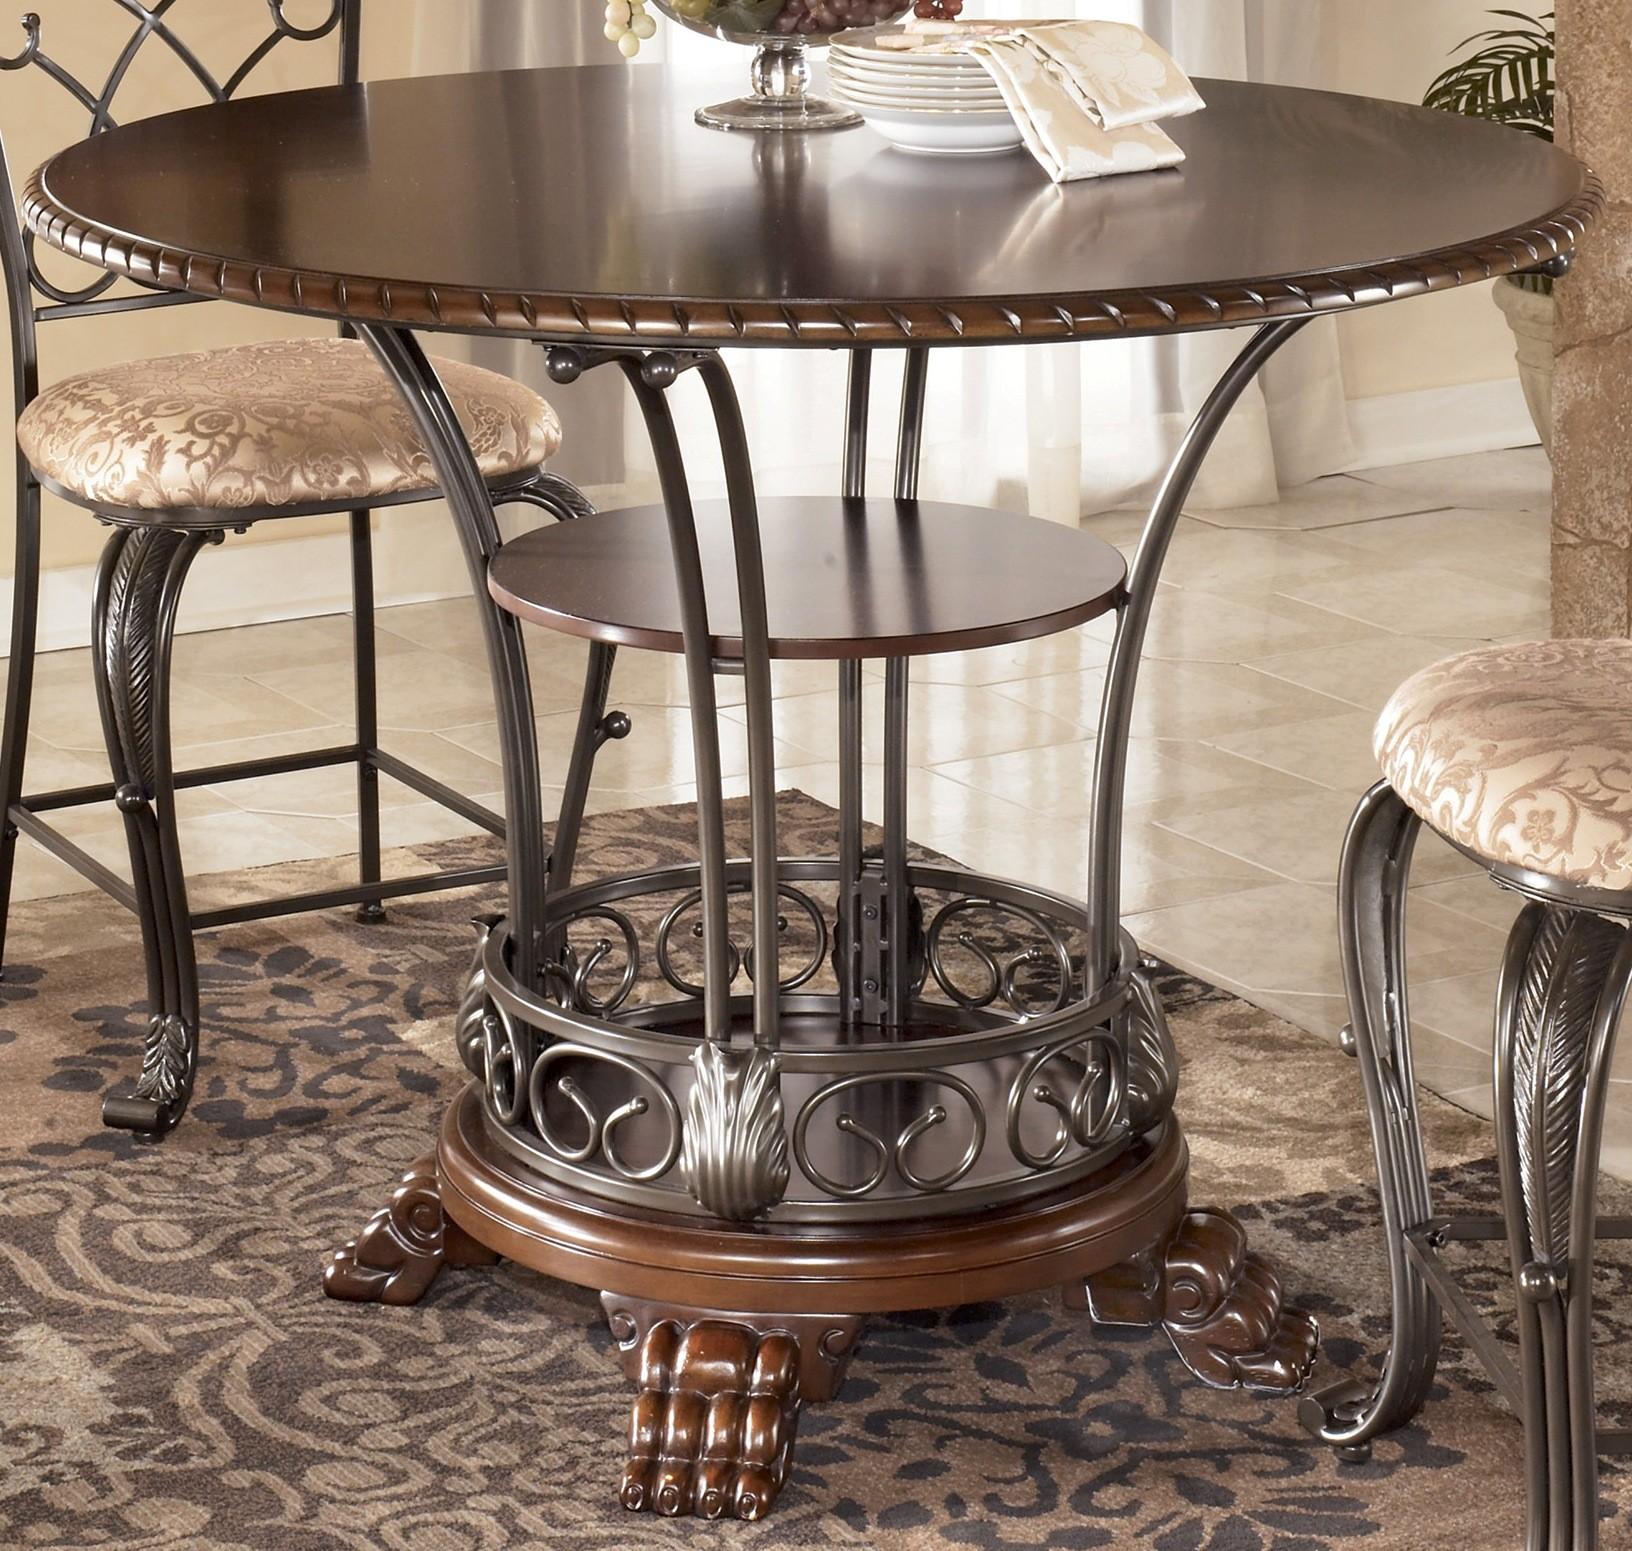 Ashley Dining Table: Ashley Alyssa Round Dining Table